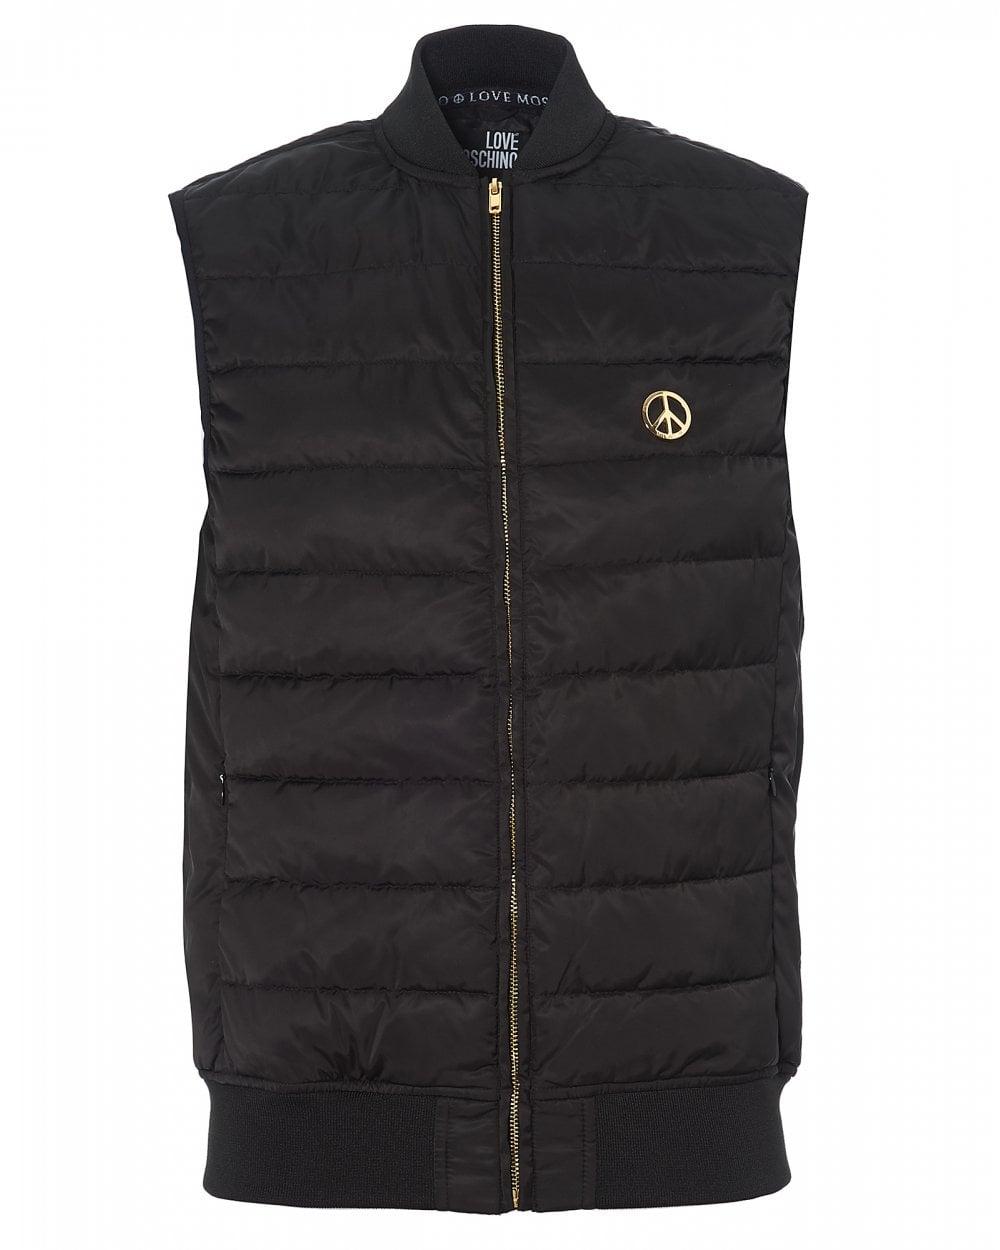 a3f79ffee2b love-moschino-mens-peace-logo-down-filled-gilet-black -jacket-p32842-144703 image.jpg